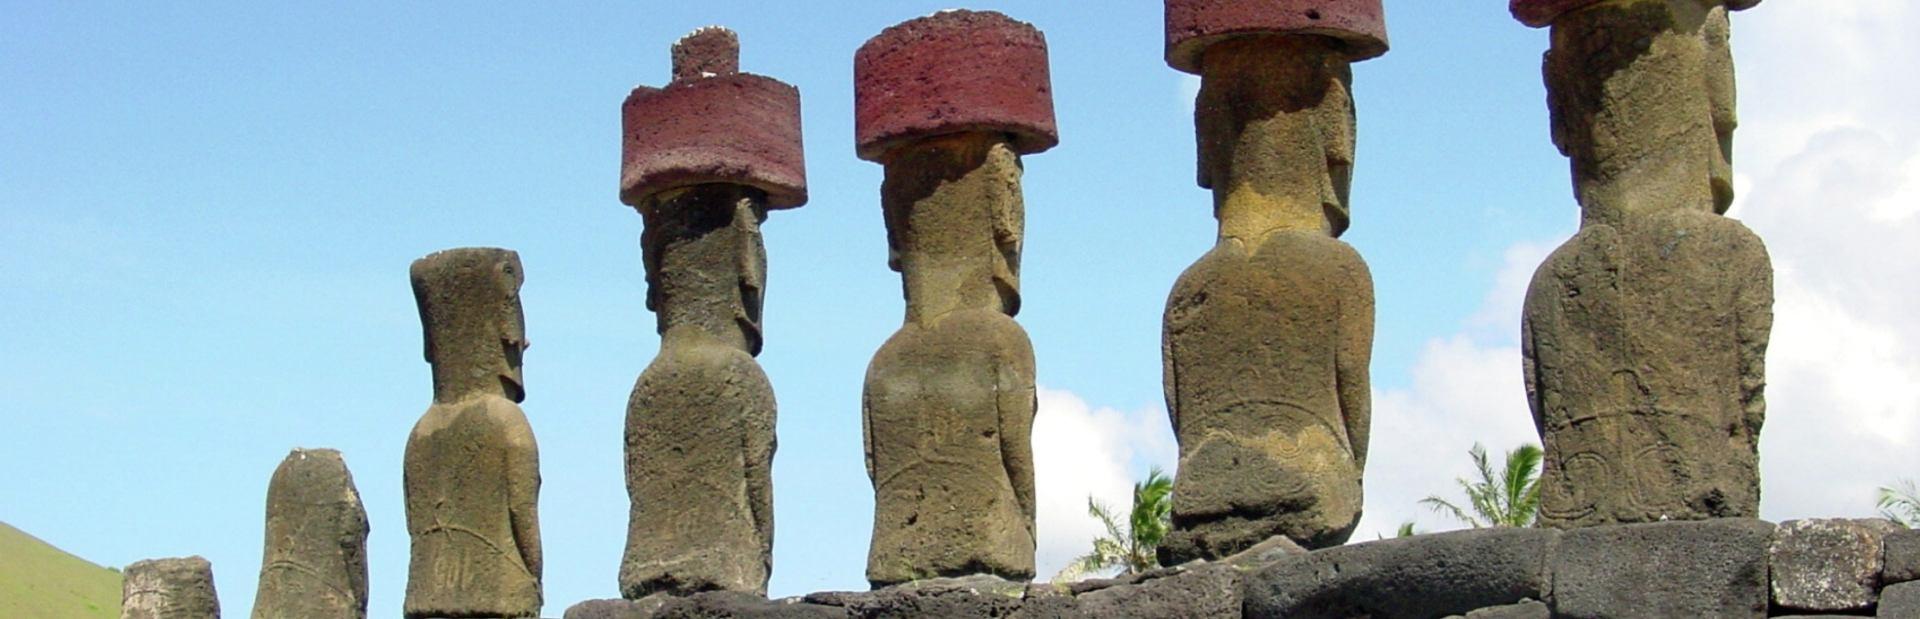 Easter Island climate photo